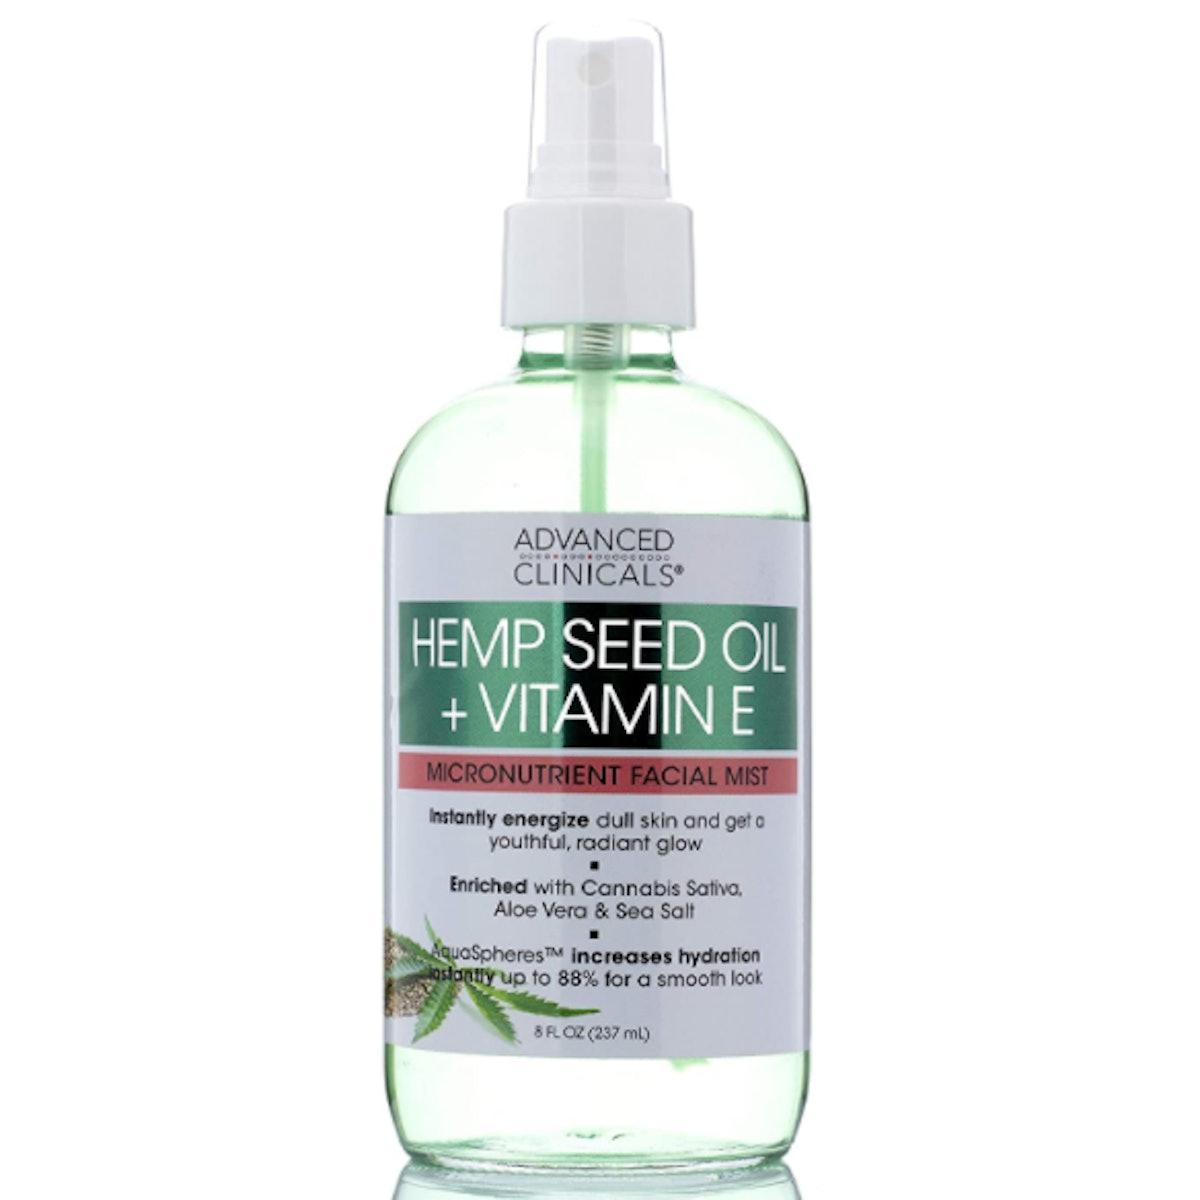 Advanced Clinicals Store Hemp + Vitamin E Face Mist